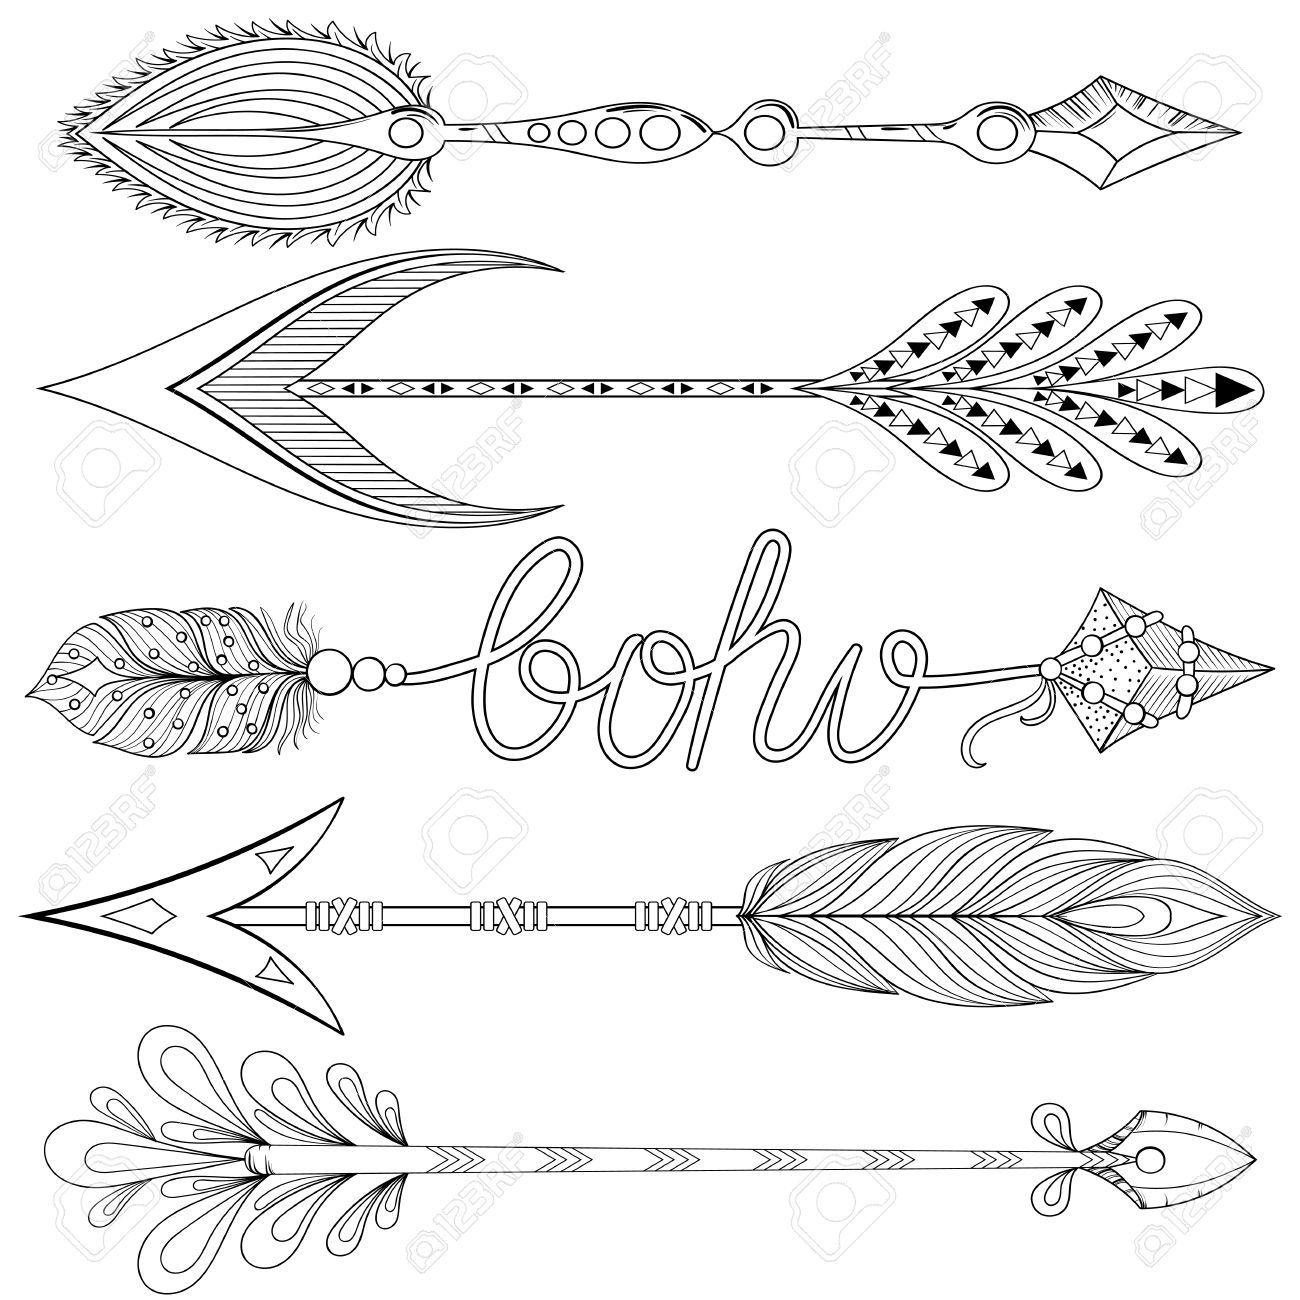 1300x1300 Bohemian Arrows Set With Feathers Hand Drawn Decorative Arrows